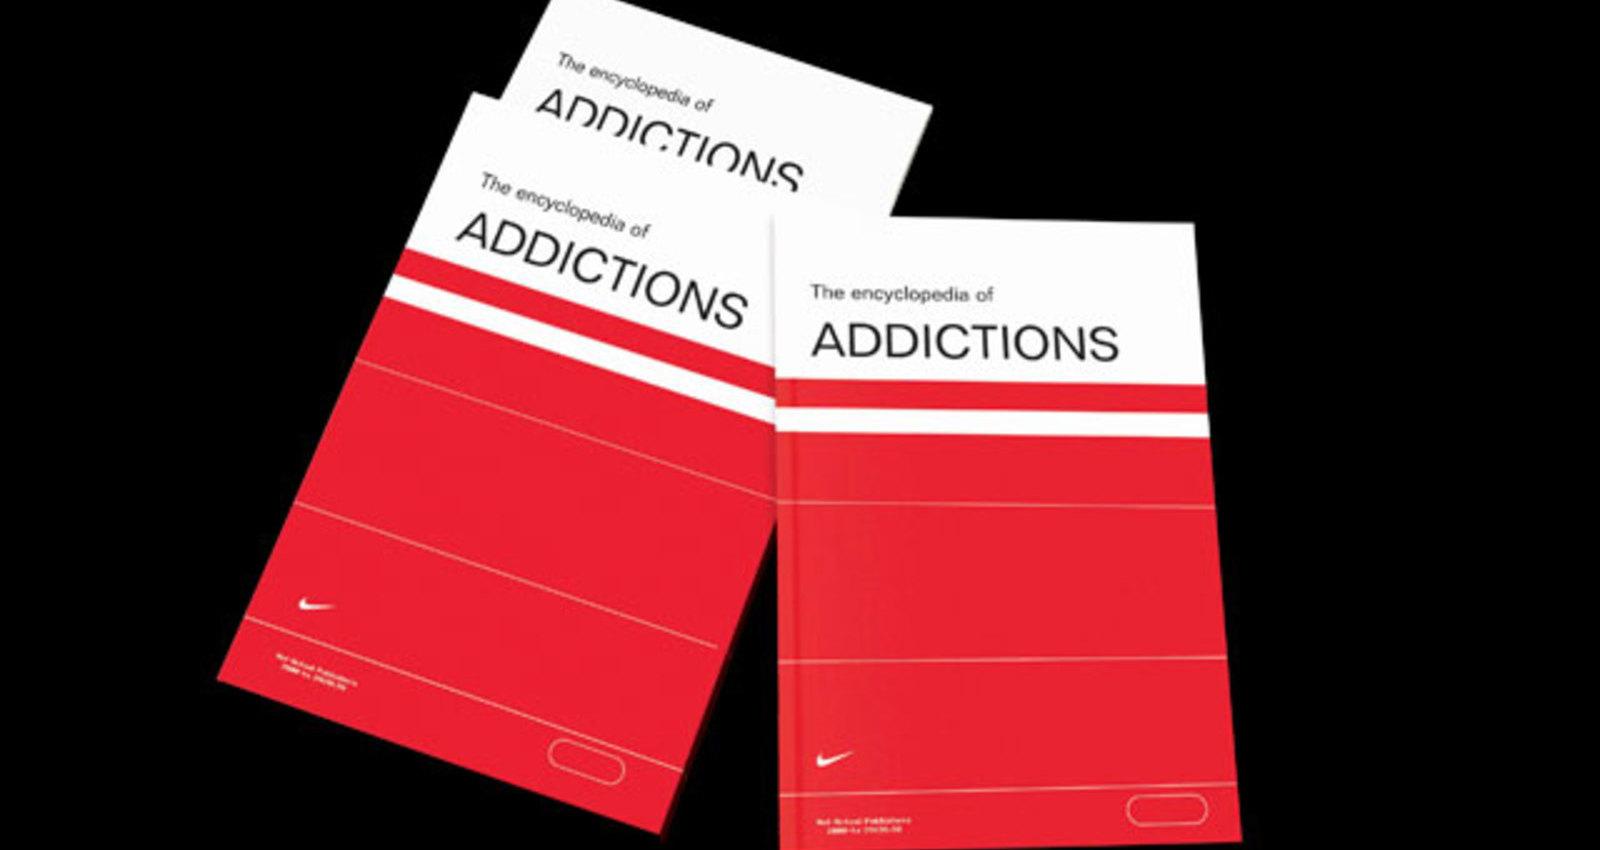 Nike Women's Apparel Book - Encyclopedia of Addictions